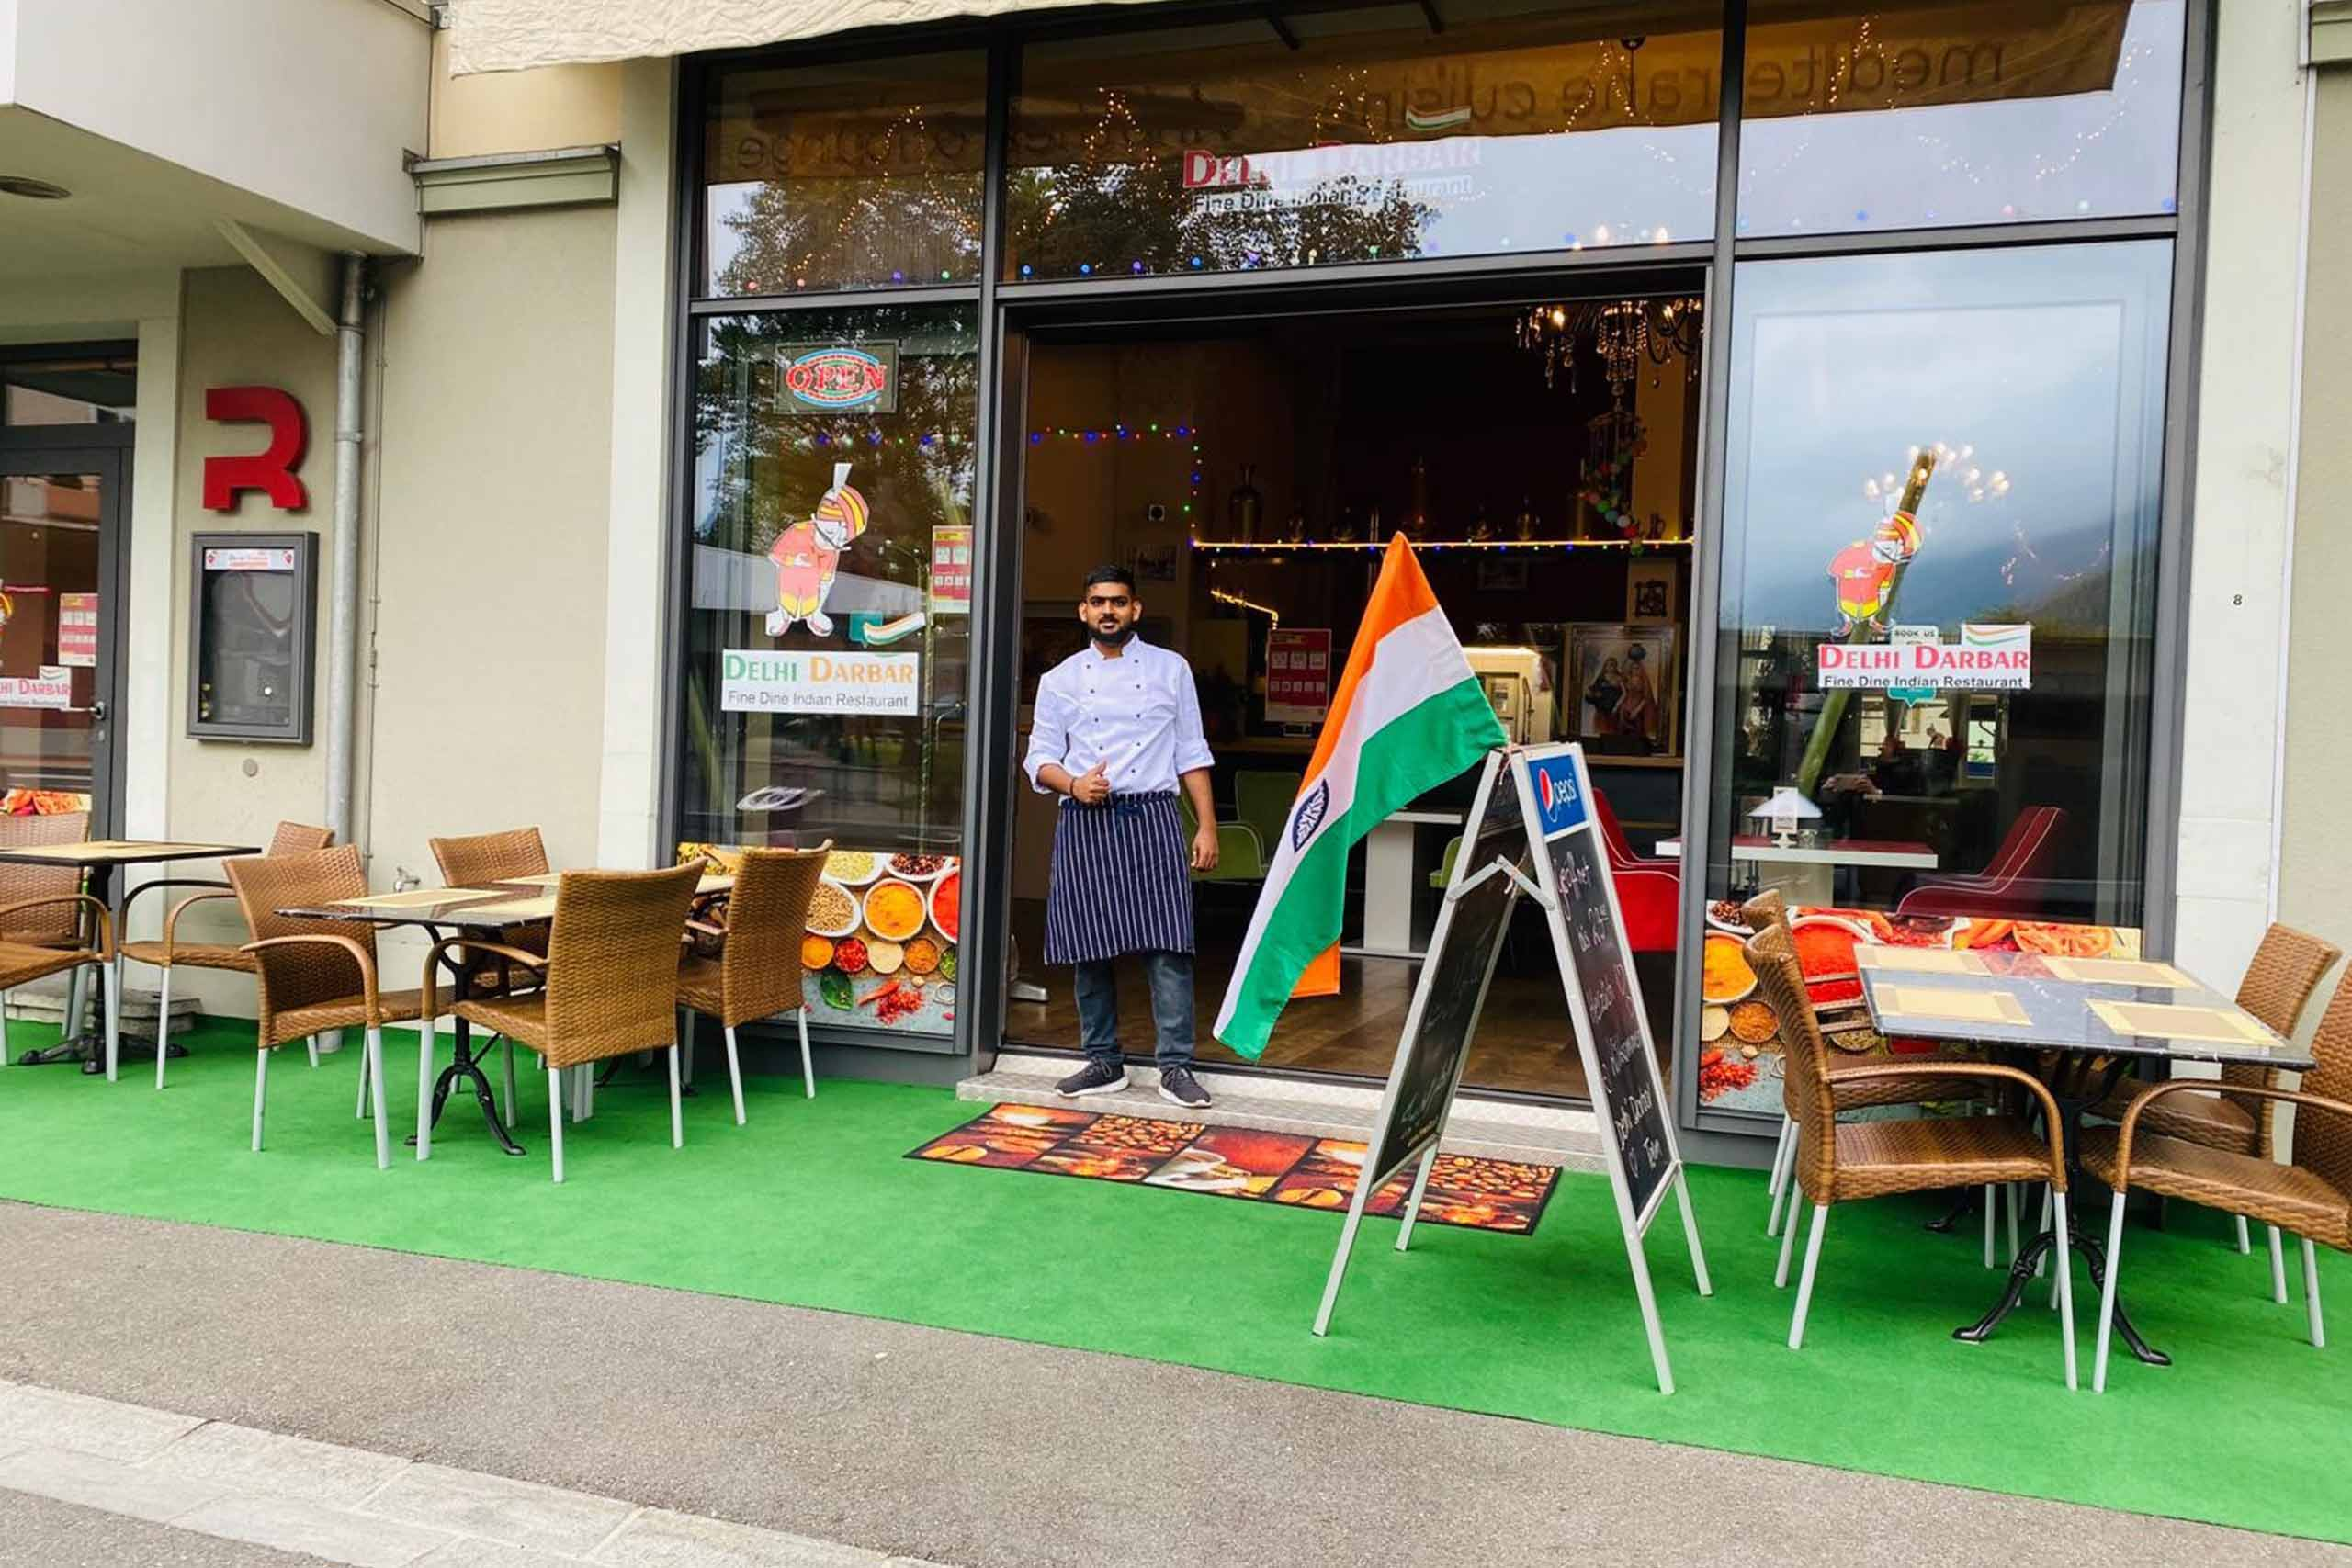 delh-darbar-indian-restaurant-aussen.jpg